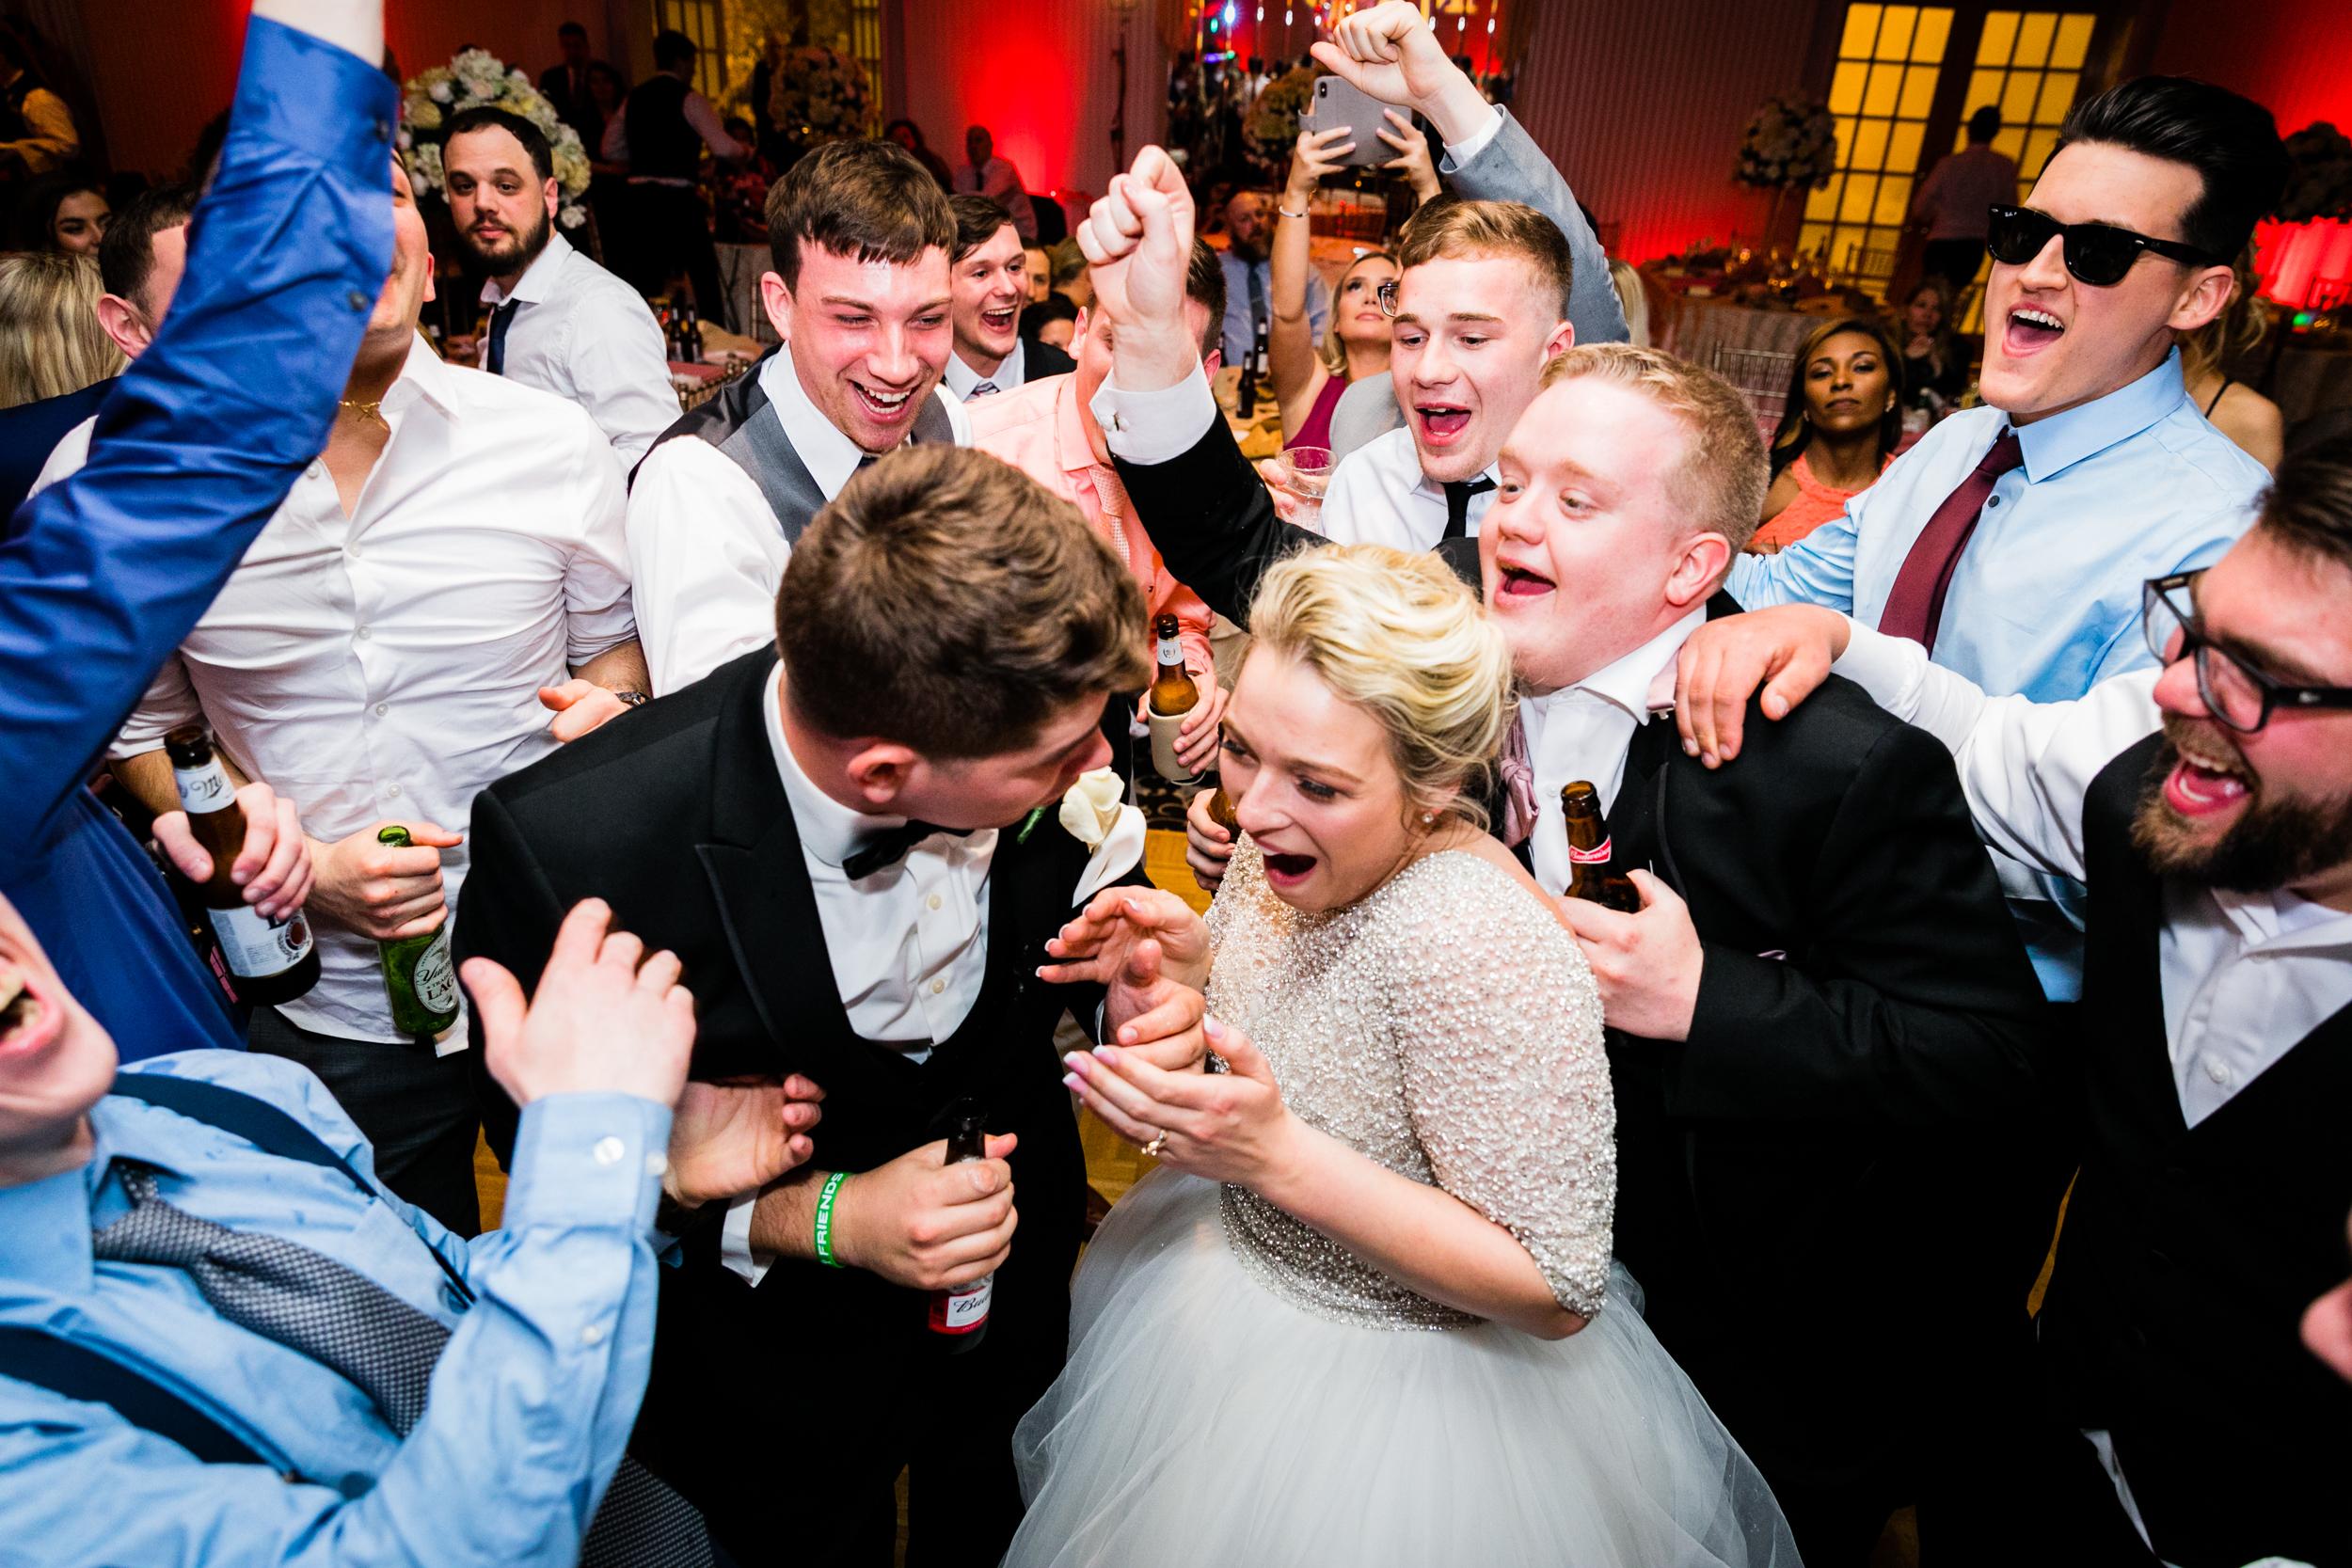 CELEBRATIONS BENSALEM WEDDING PHOTOGRAPHY-122.jpg